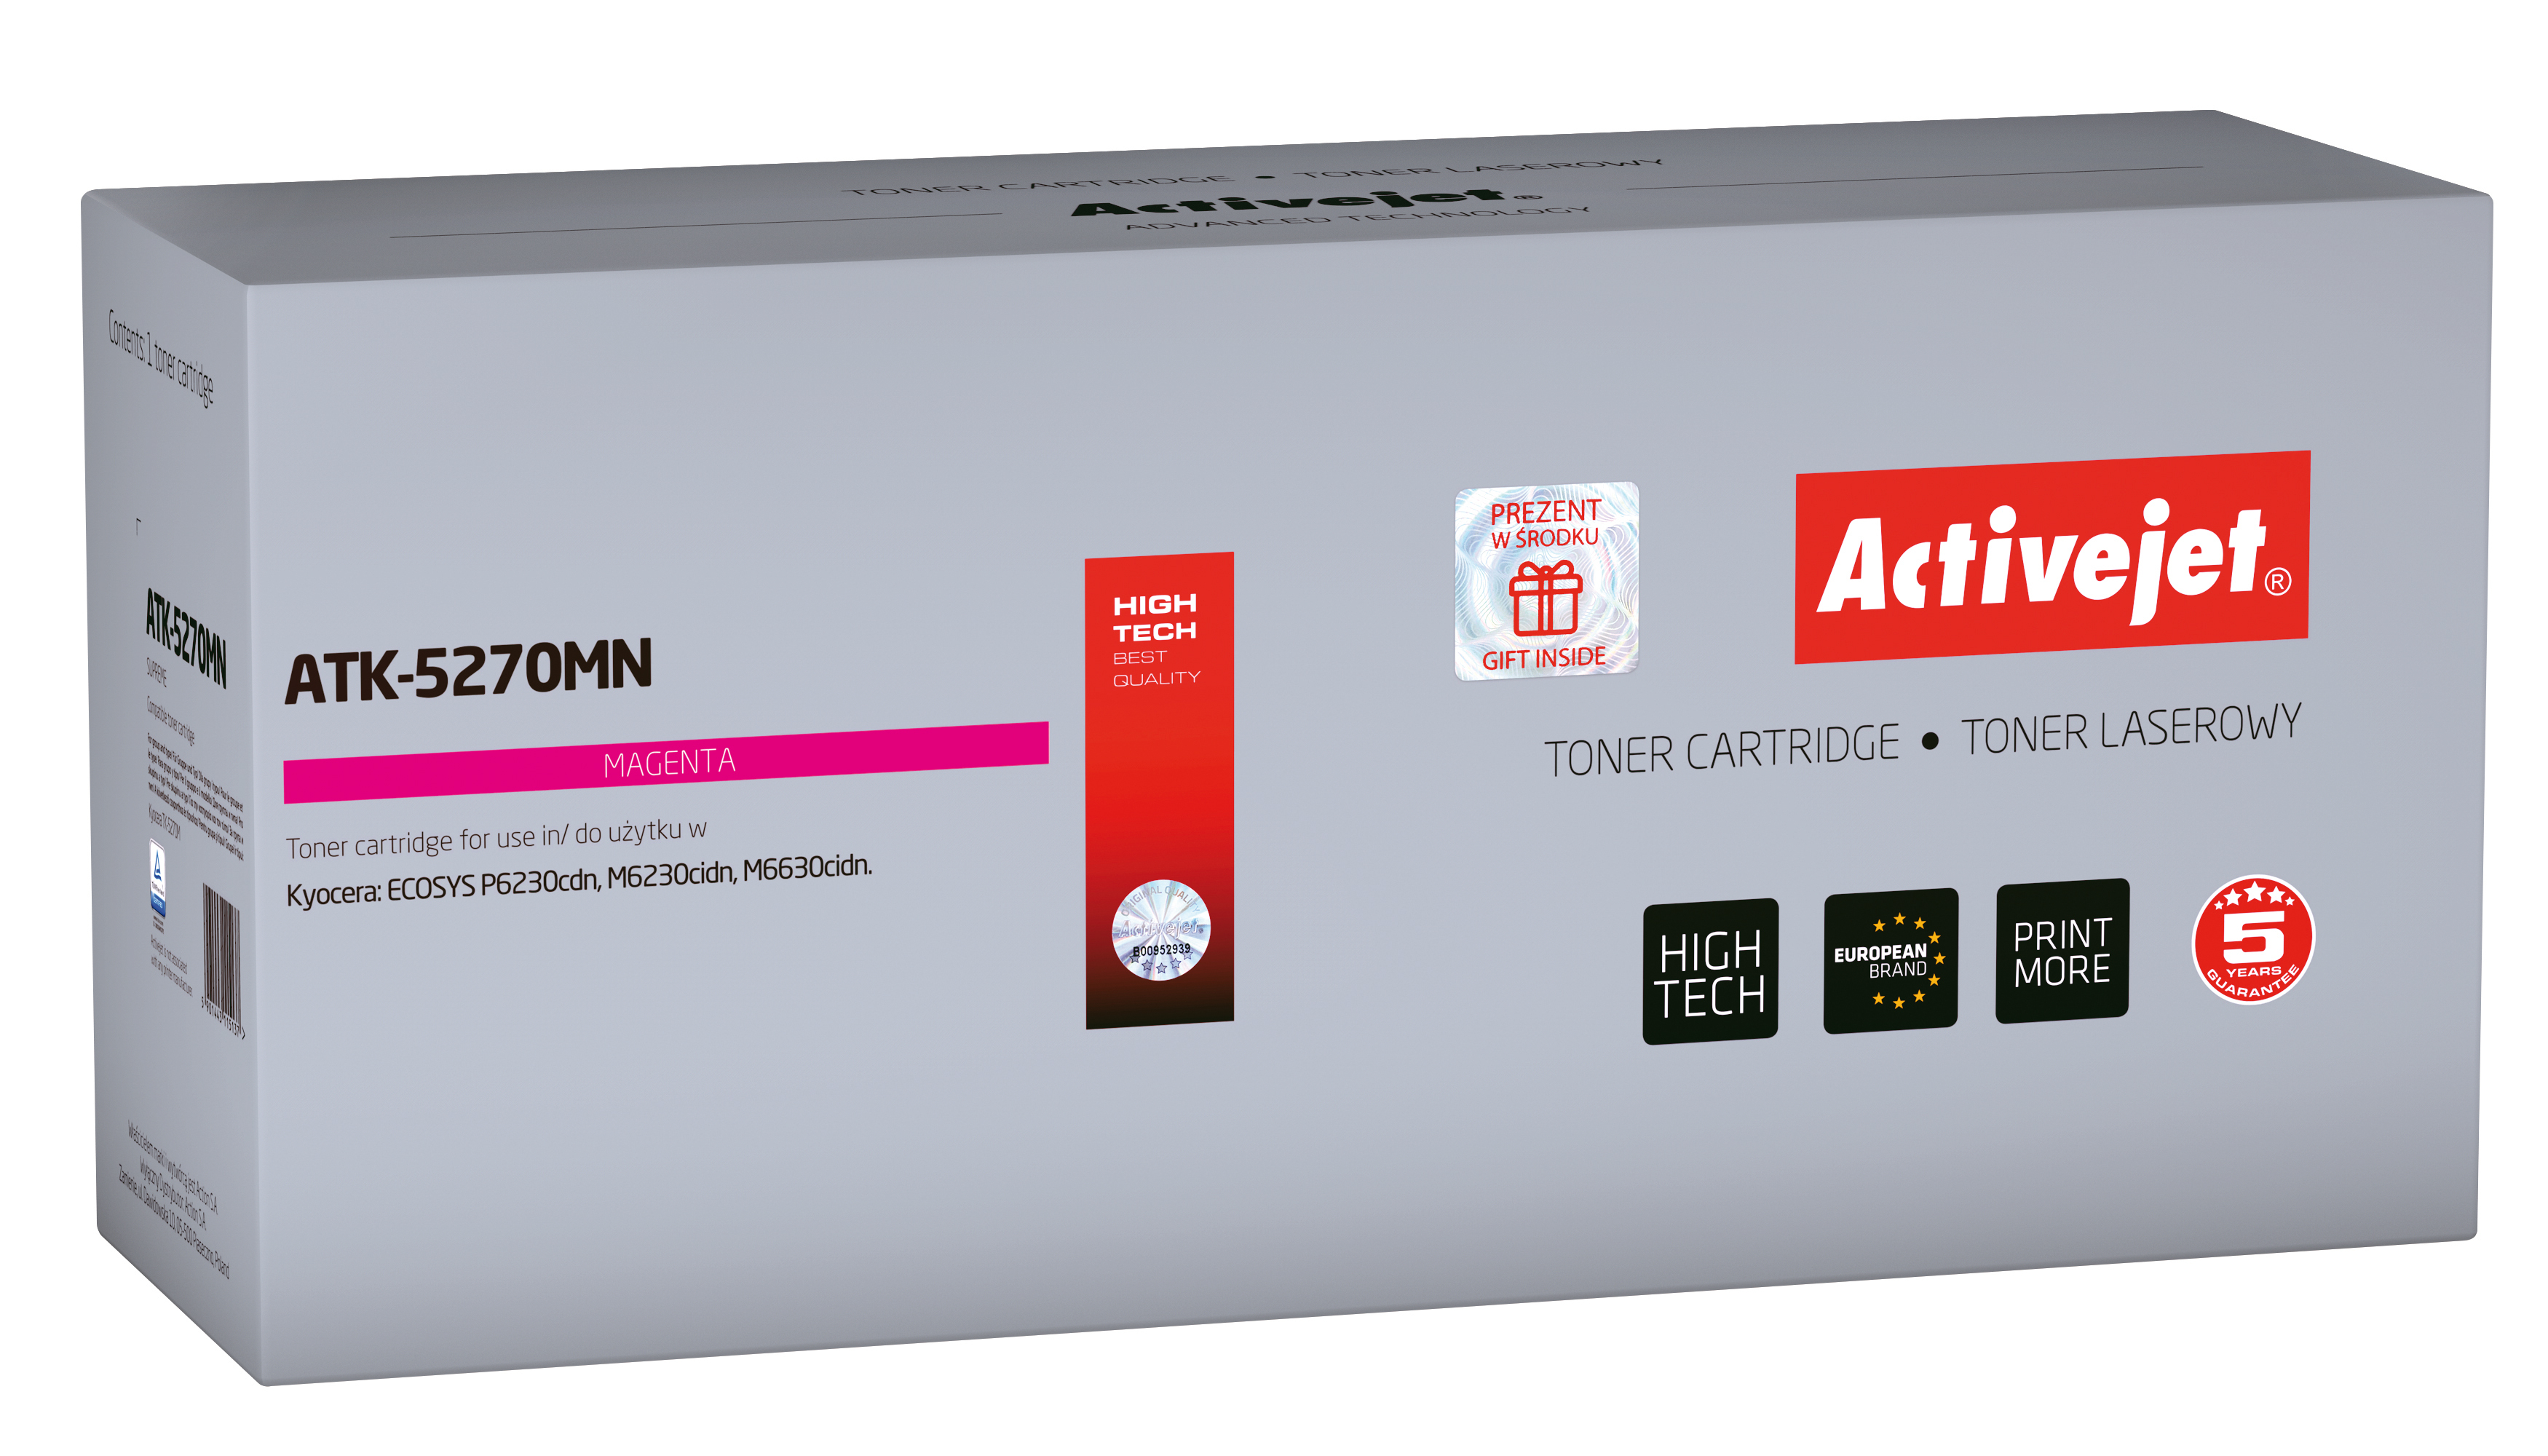 Toner Activejet  ATK-5270MN do drukarki Kyocera, Zamiennik Kyocera TK-5270M; Supreme; 6000 stron; Purpurowy.